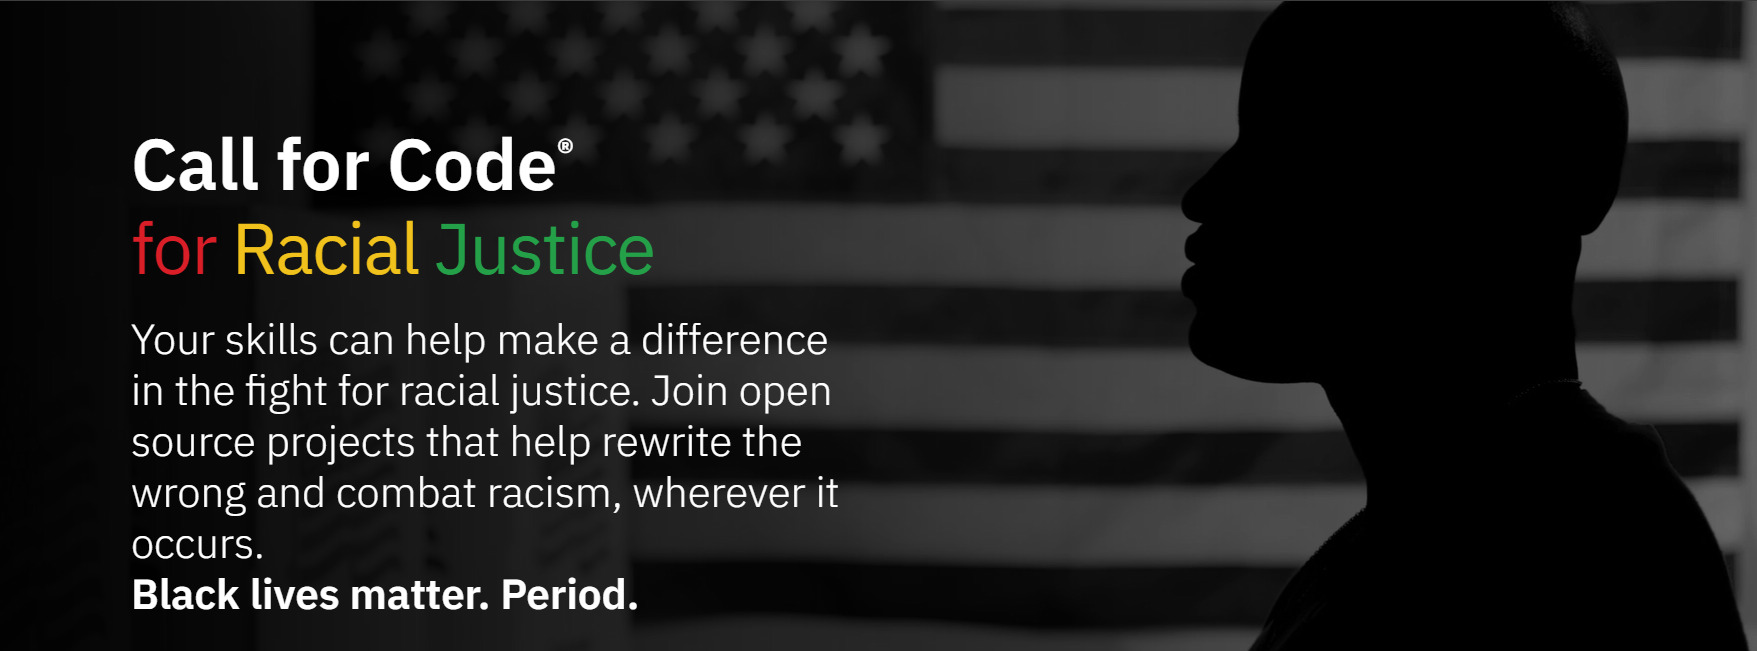 Linux 基金会新增 7 个项目以支持种族正义